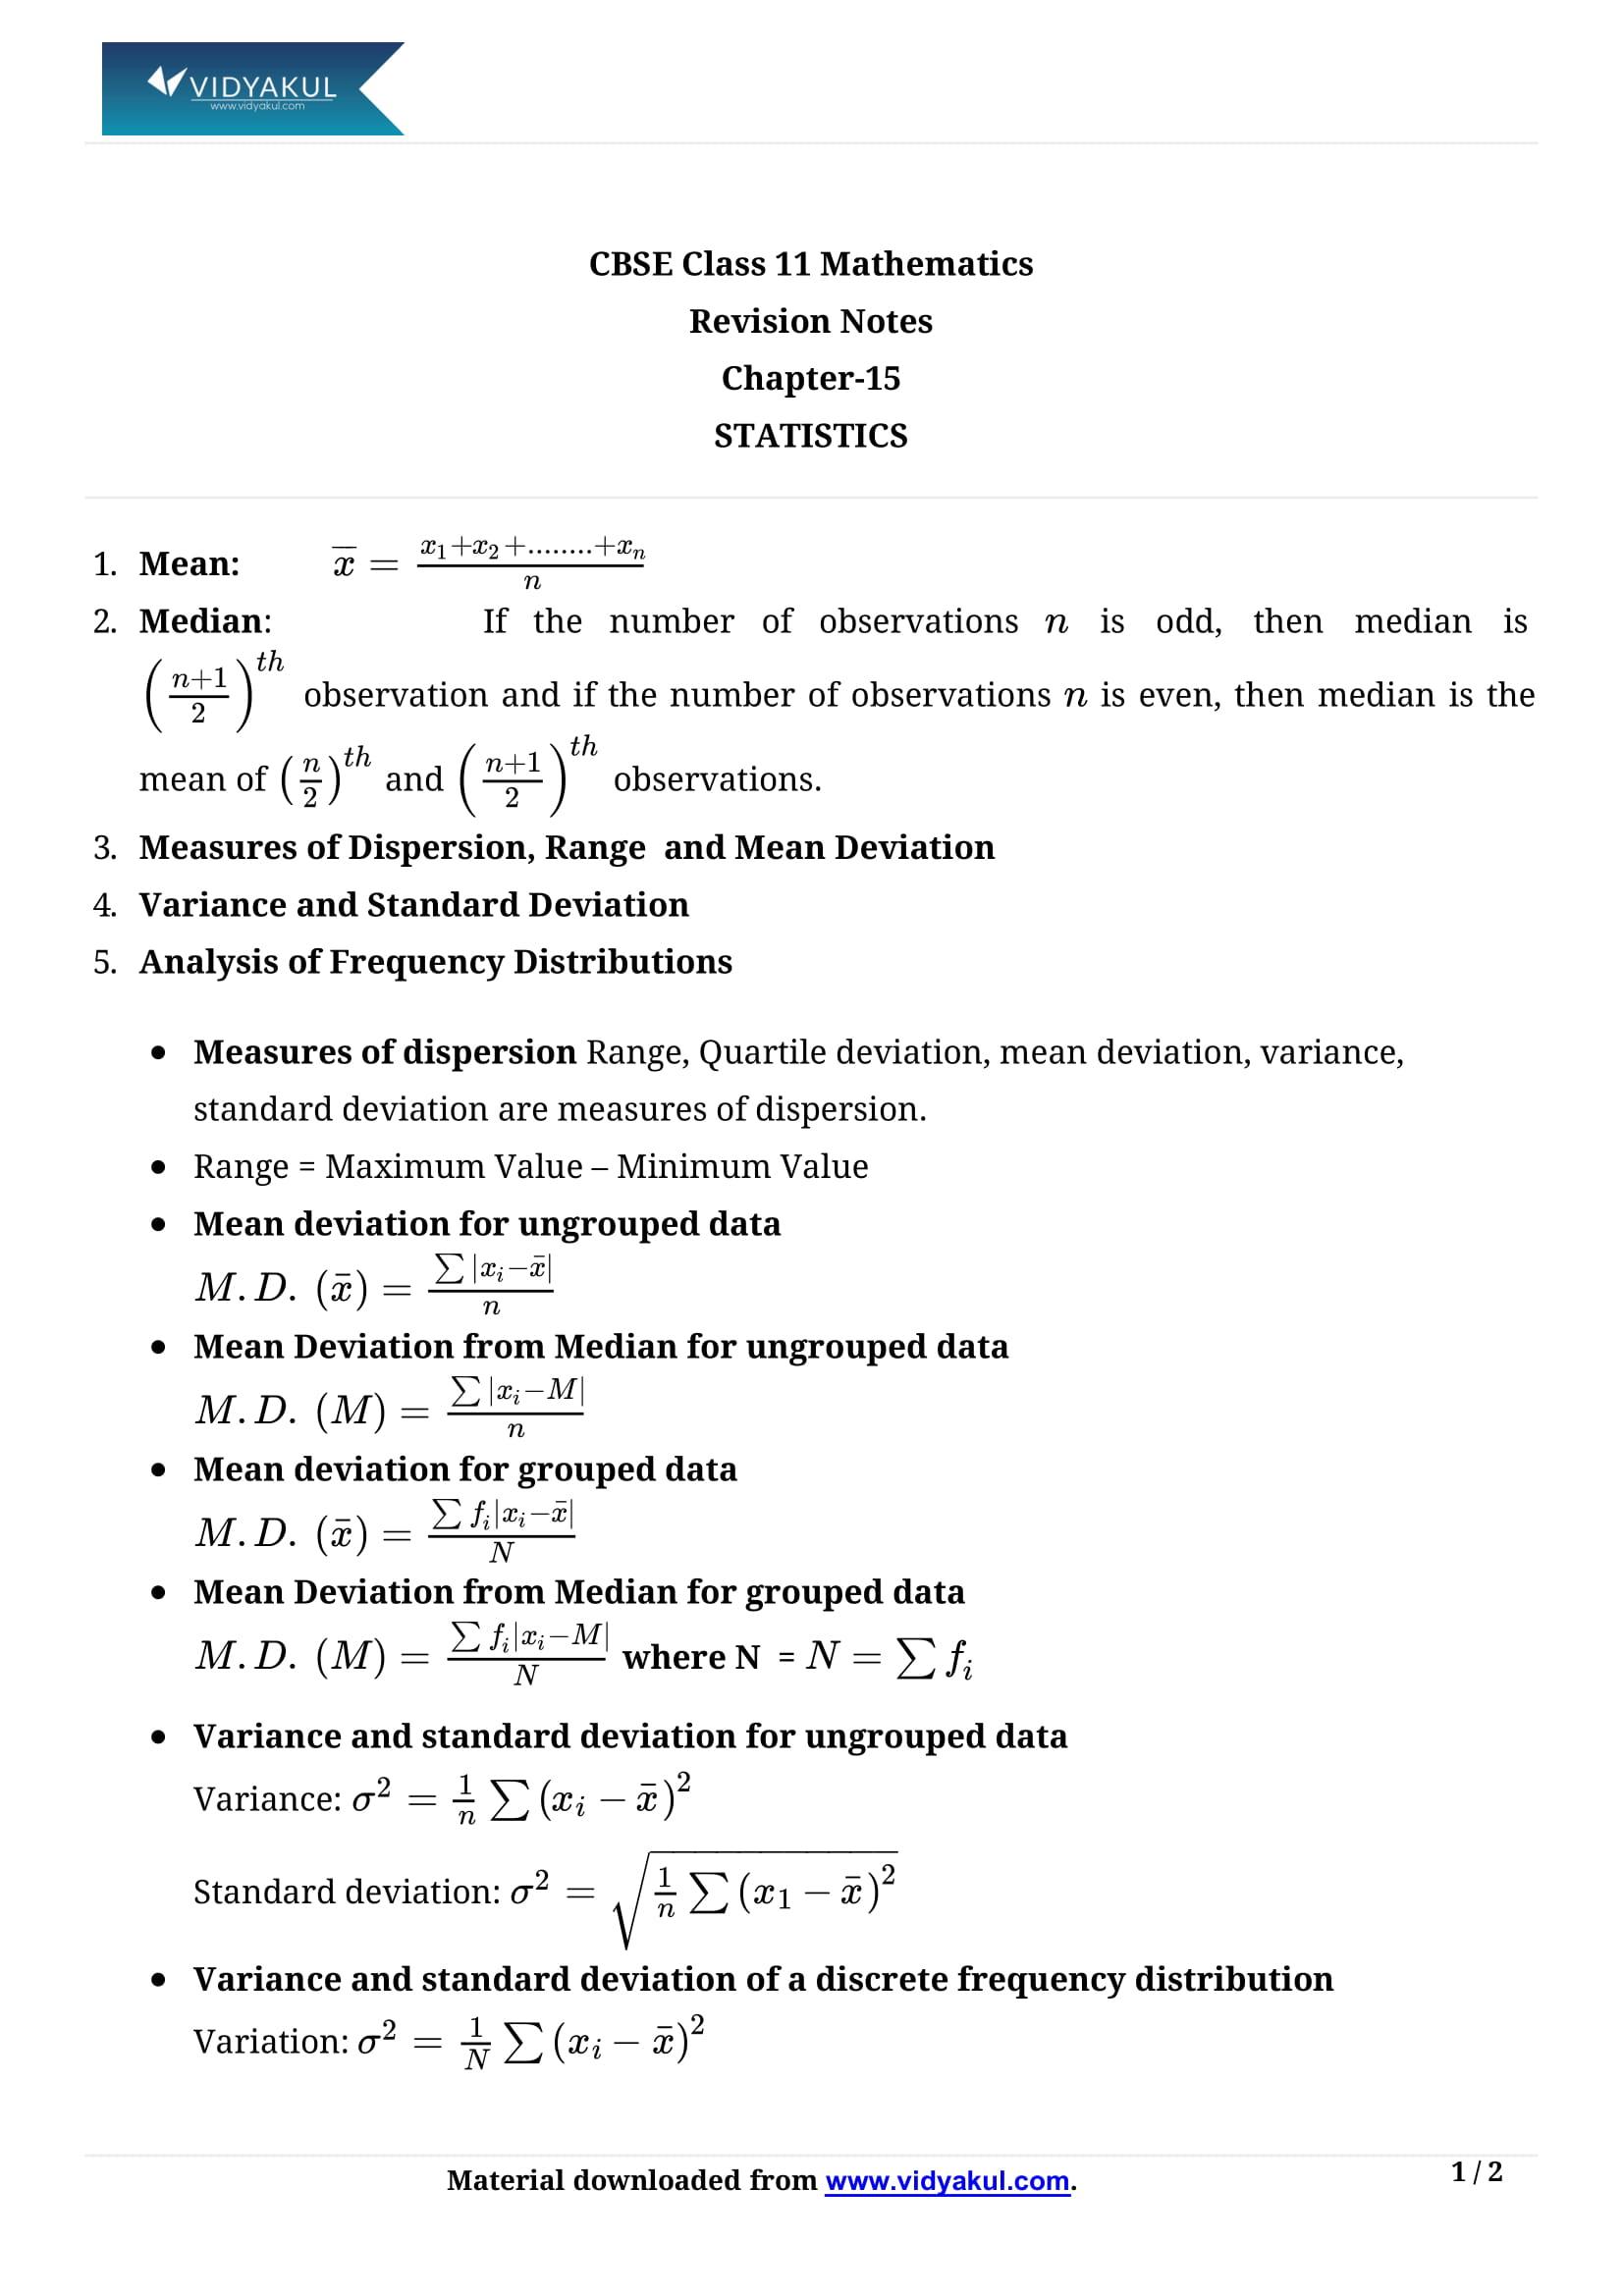 Statistics Class 11 Formulas & Notes   Vidyakul